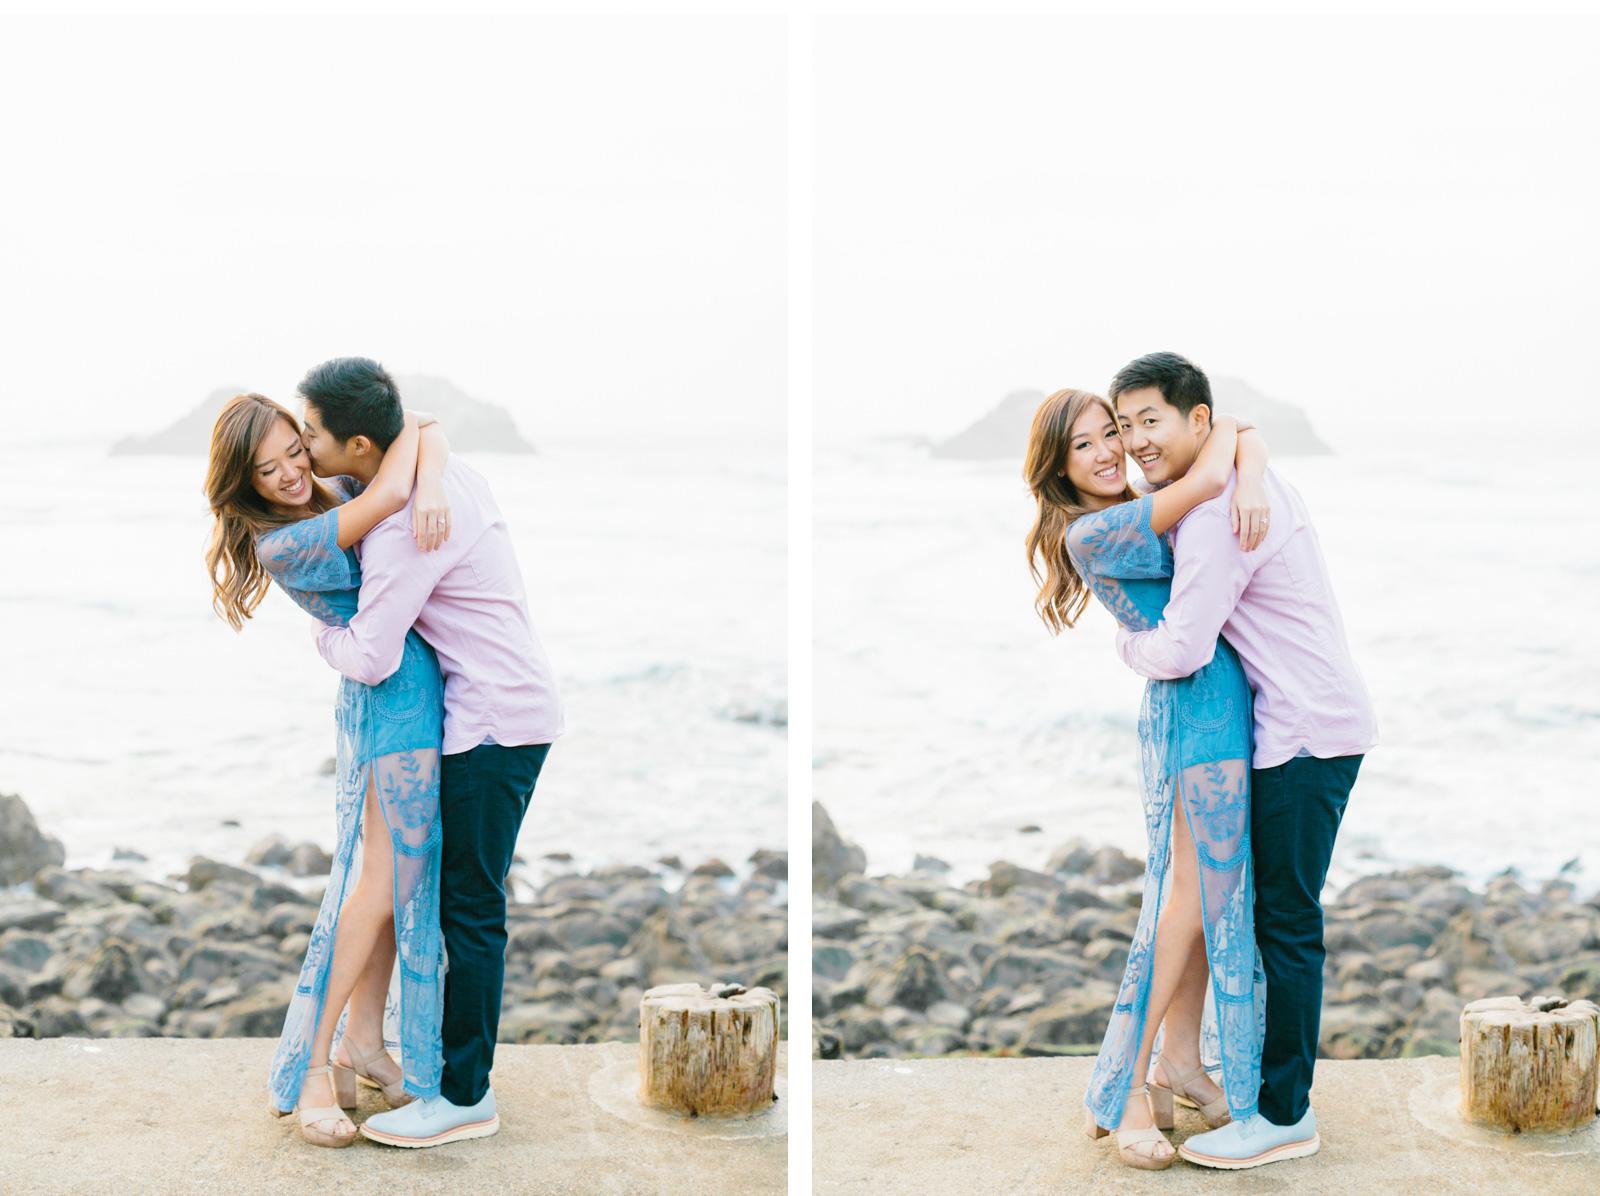 Malibu-Wedding-Venues-Natalie-Schutt-Photography-Style-Me-Pretty-Top-Weddings_04.jpg